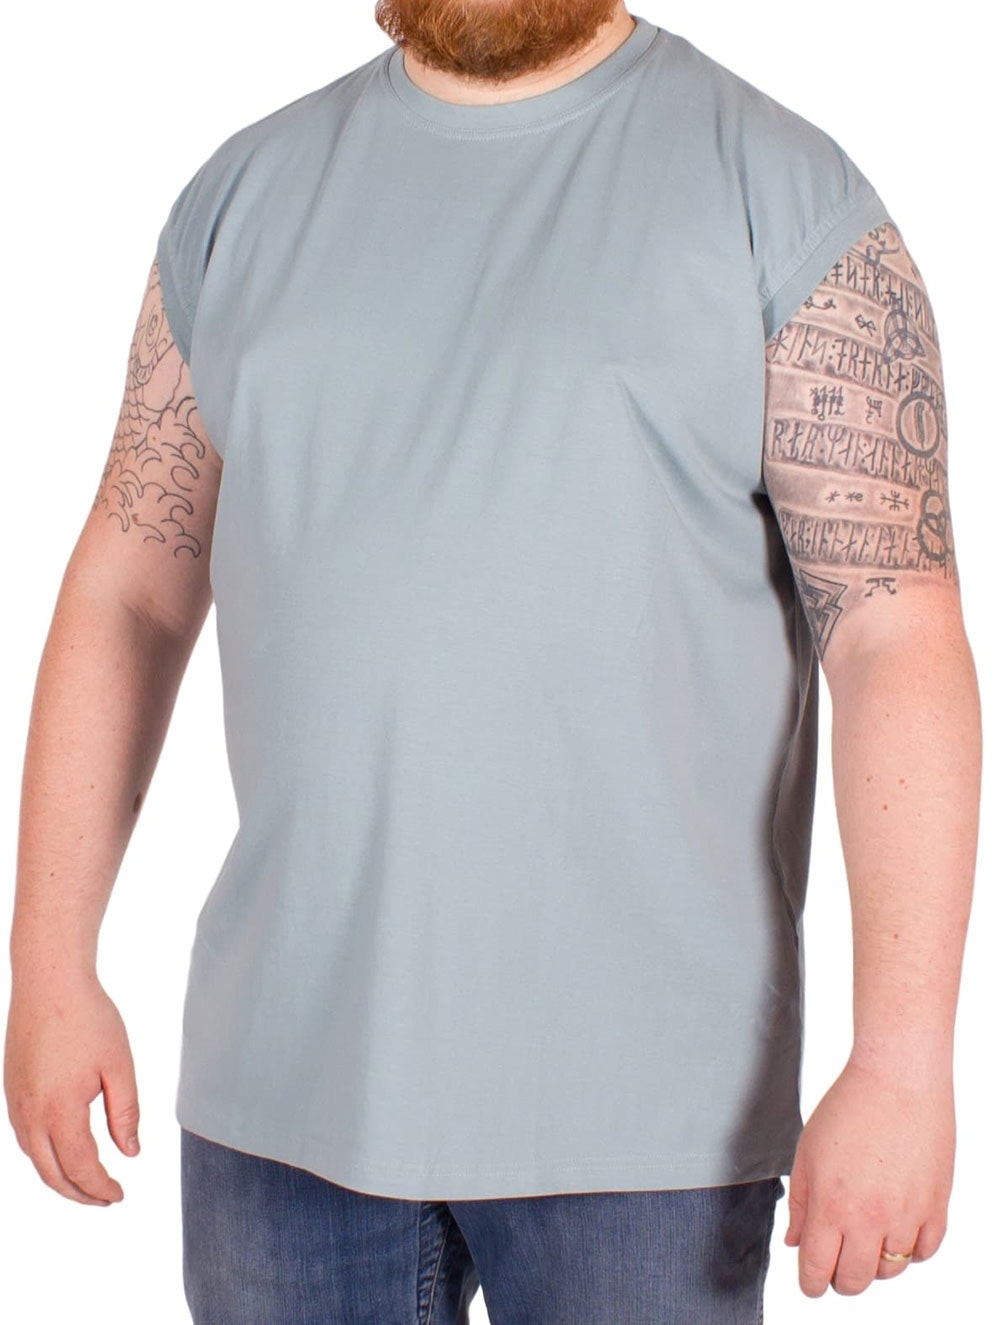 Metaphor Sleeveless T-Shirt Blue